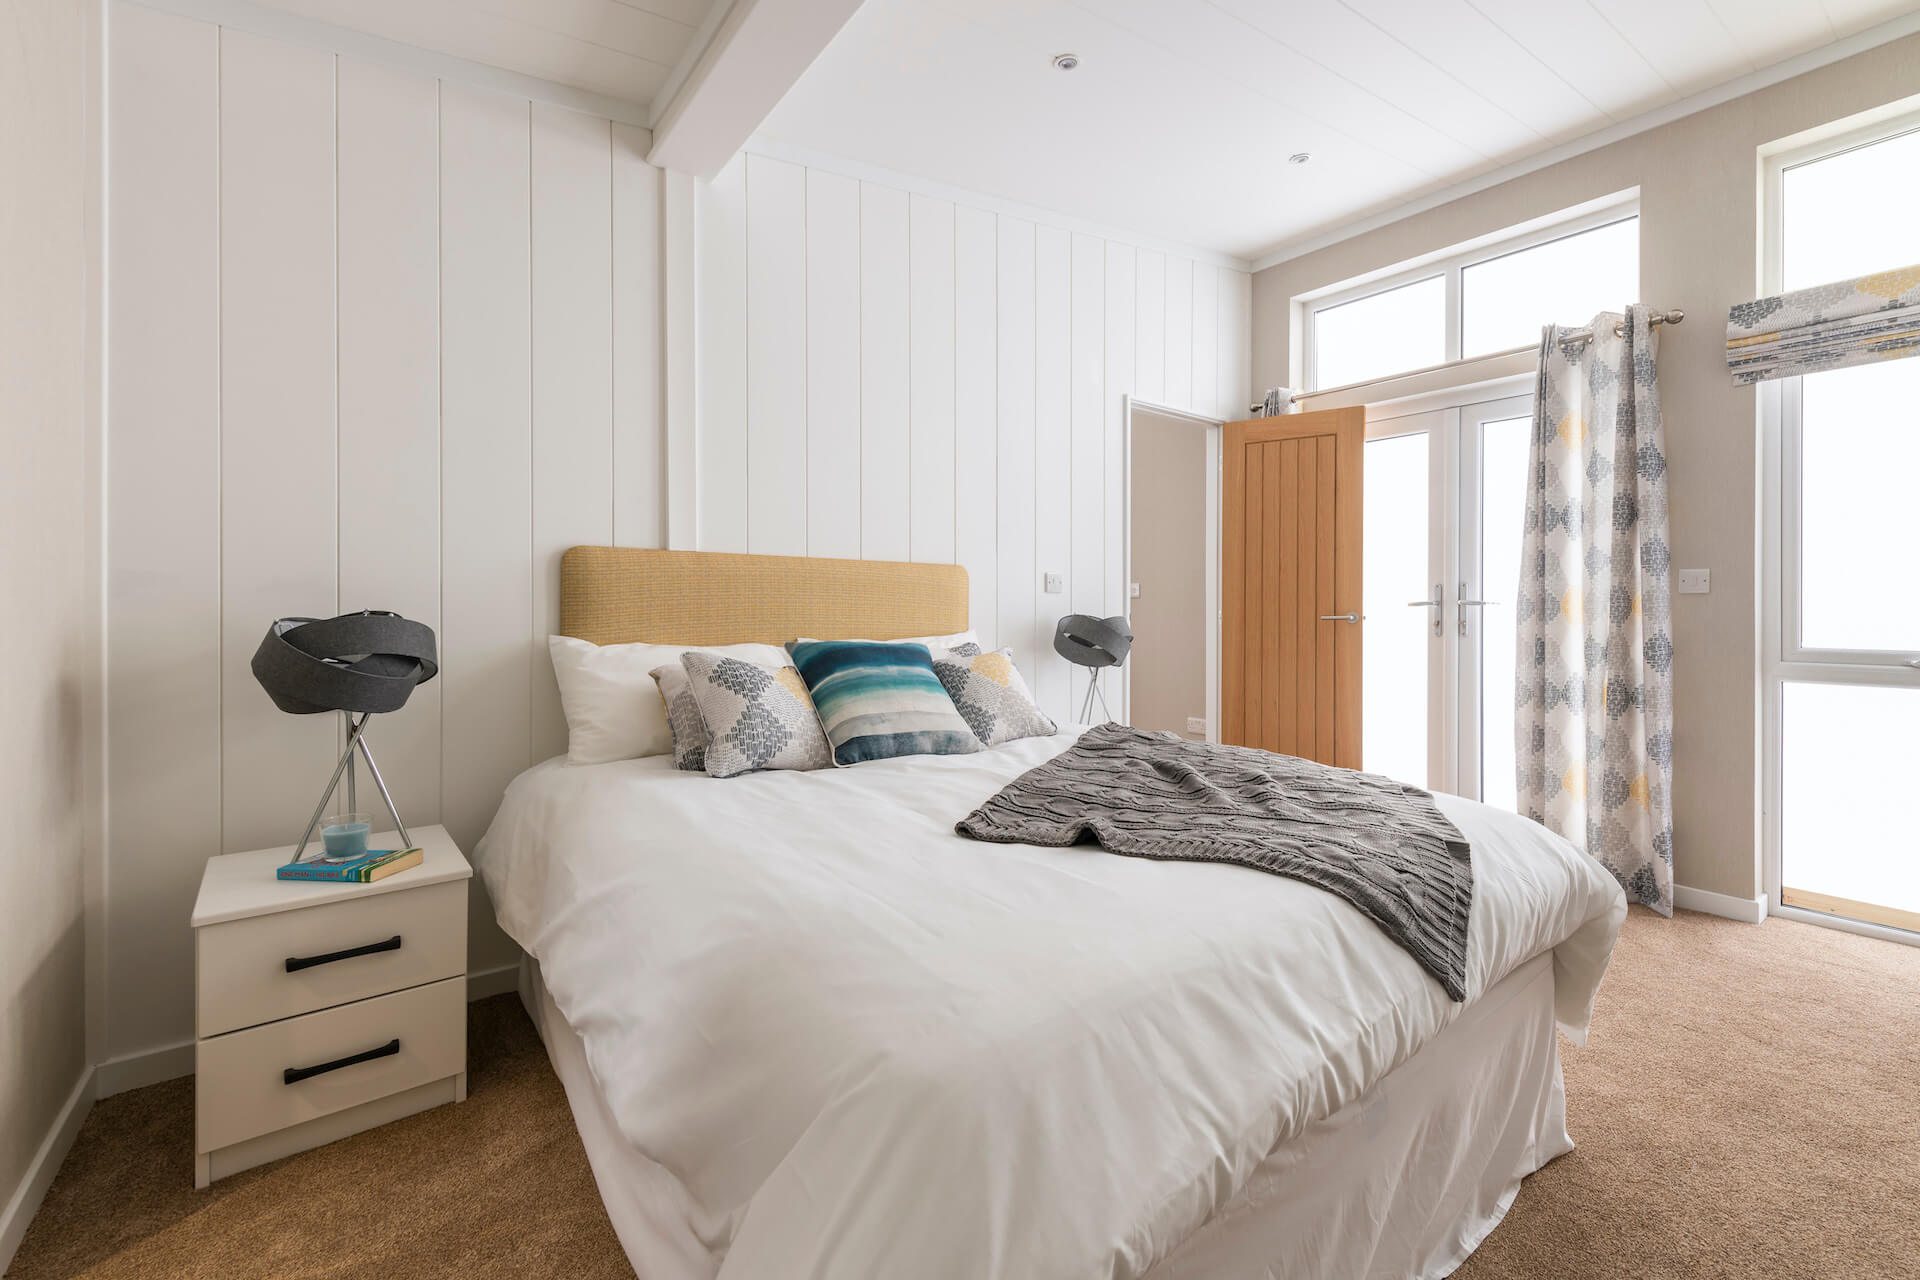 Omar-Atrium-Monopitch-Master-Bedroom